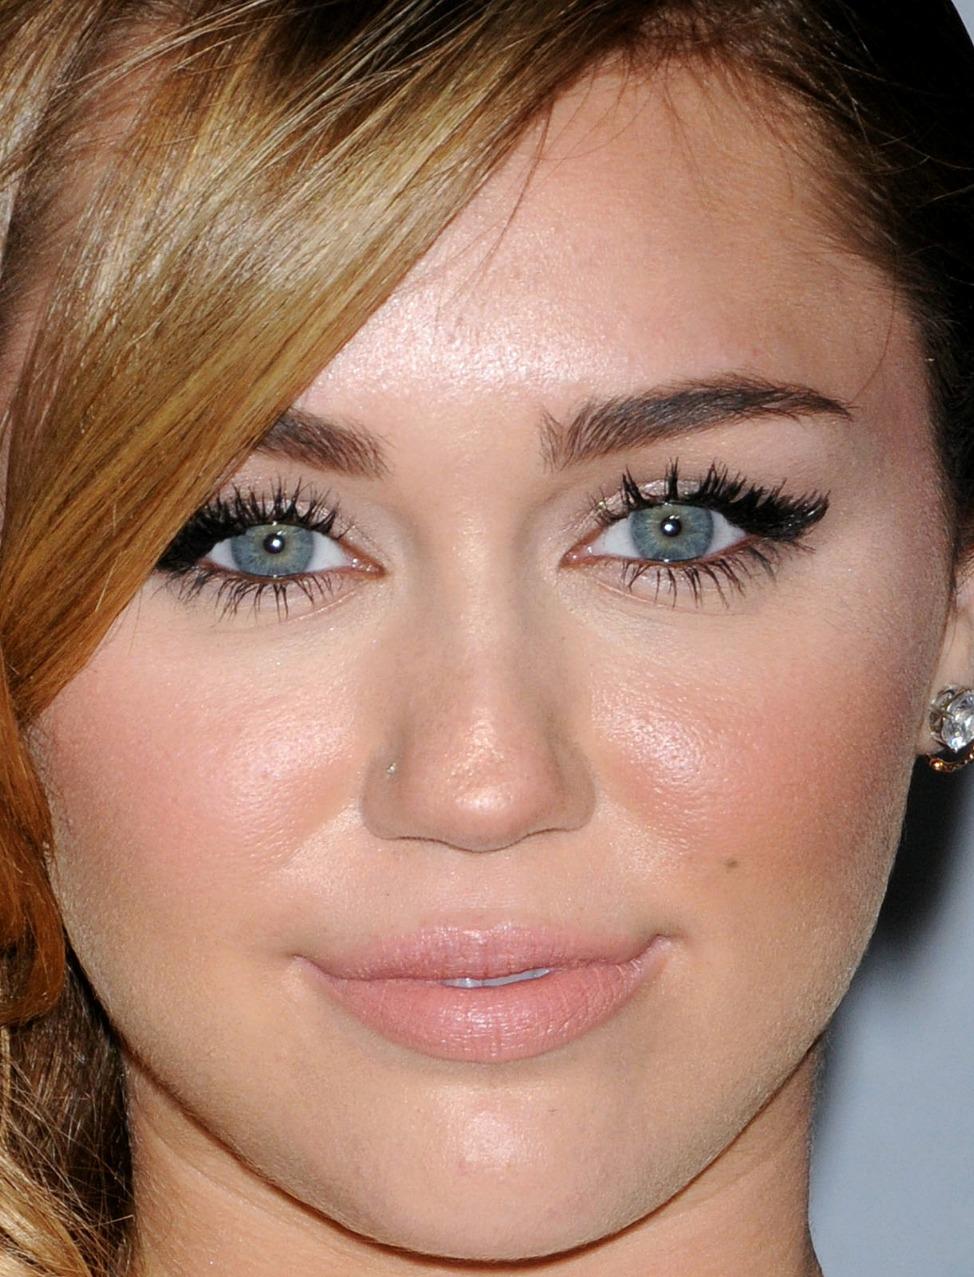 Amazoncom  MAC Lipstick Viva Glam Miley Cyrus  Beauty